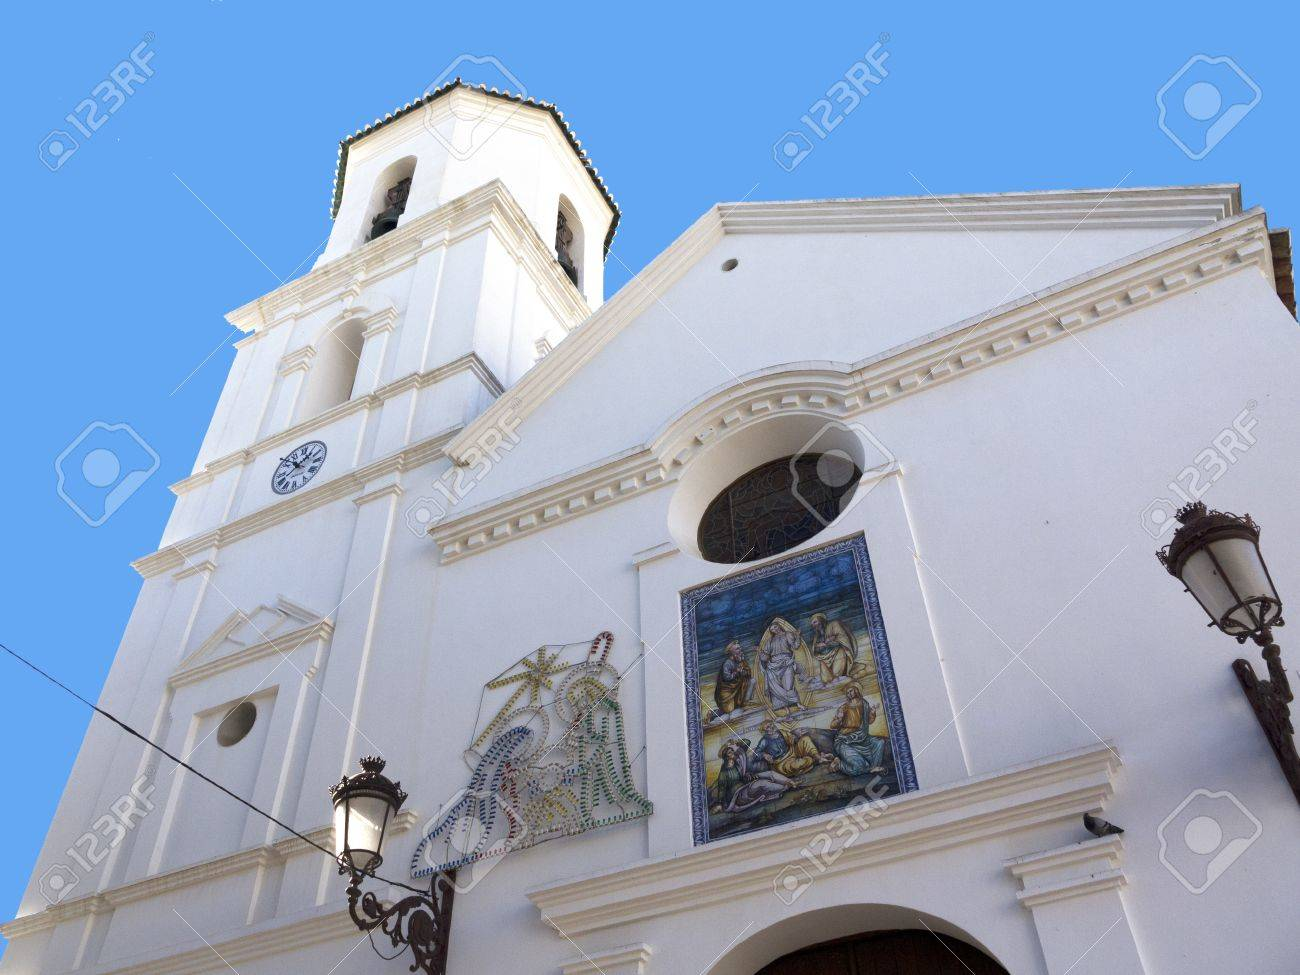 Parish Church of San Salvatore in Nerja Andalucia Spain Stock Photo - 17391642